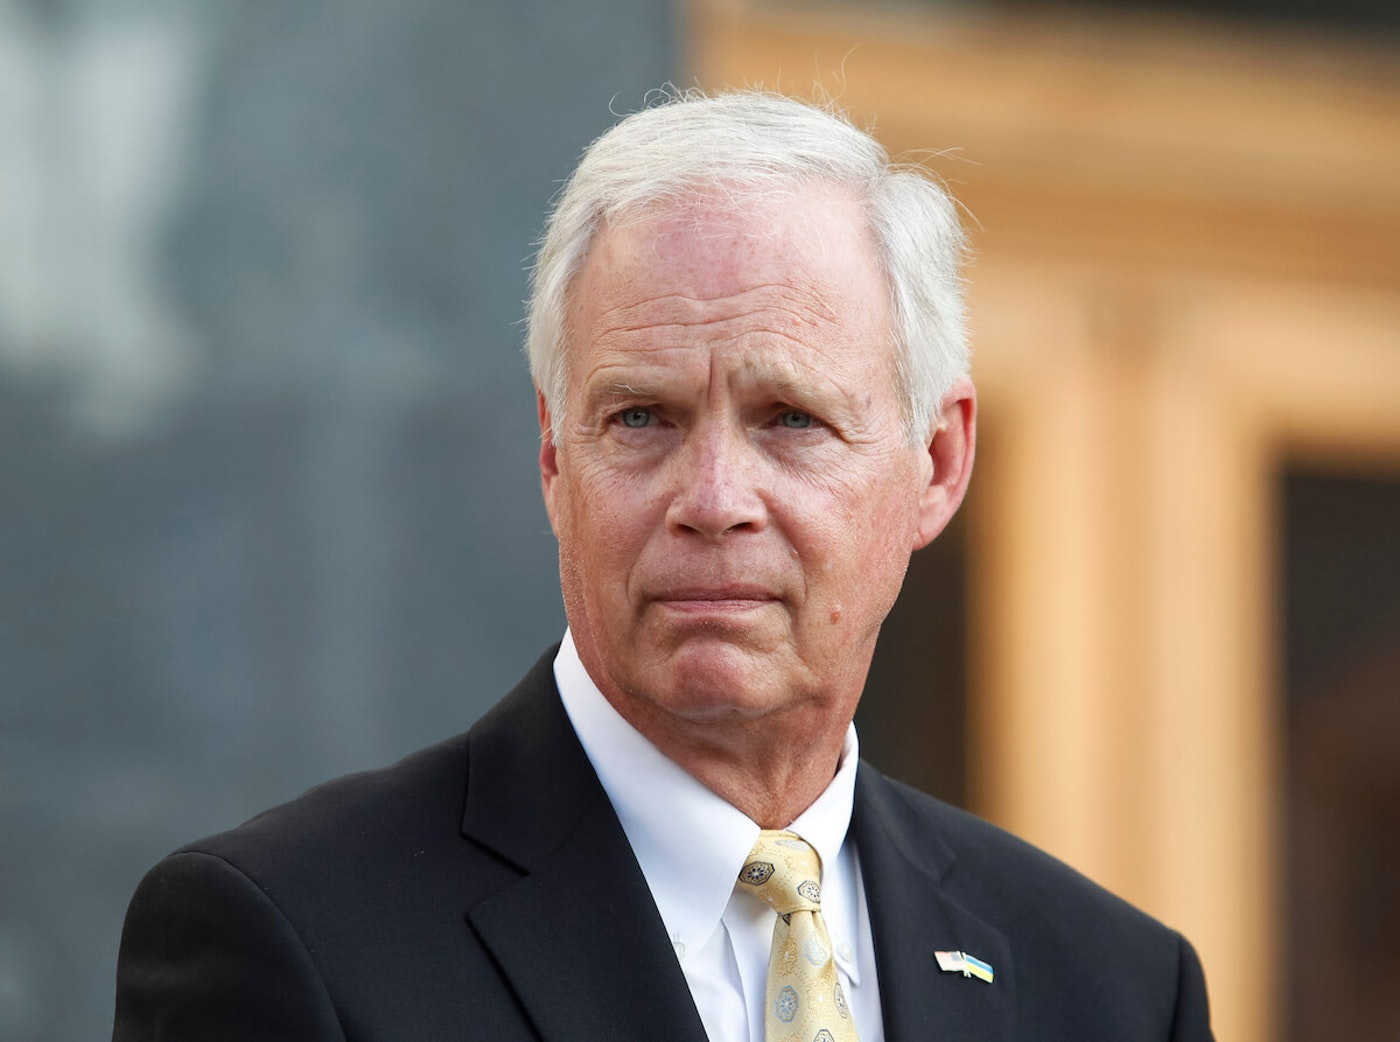 Sen. Ron Johnson, image via Shutterstock